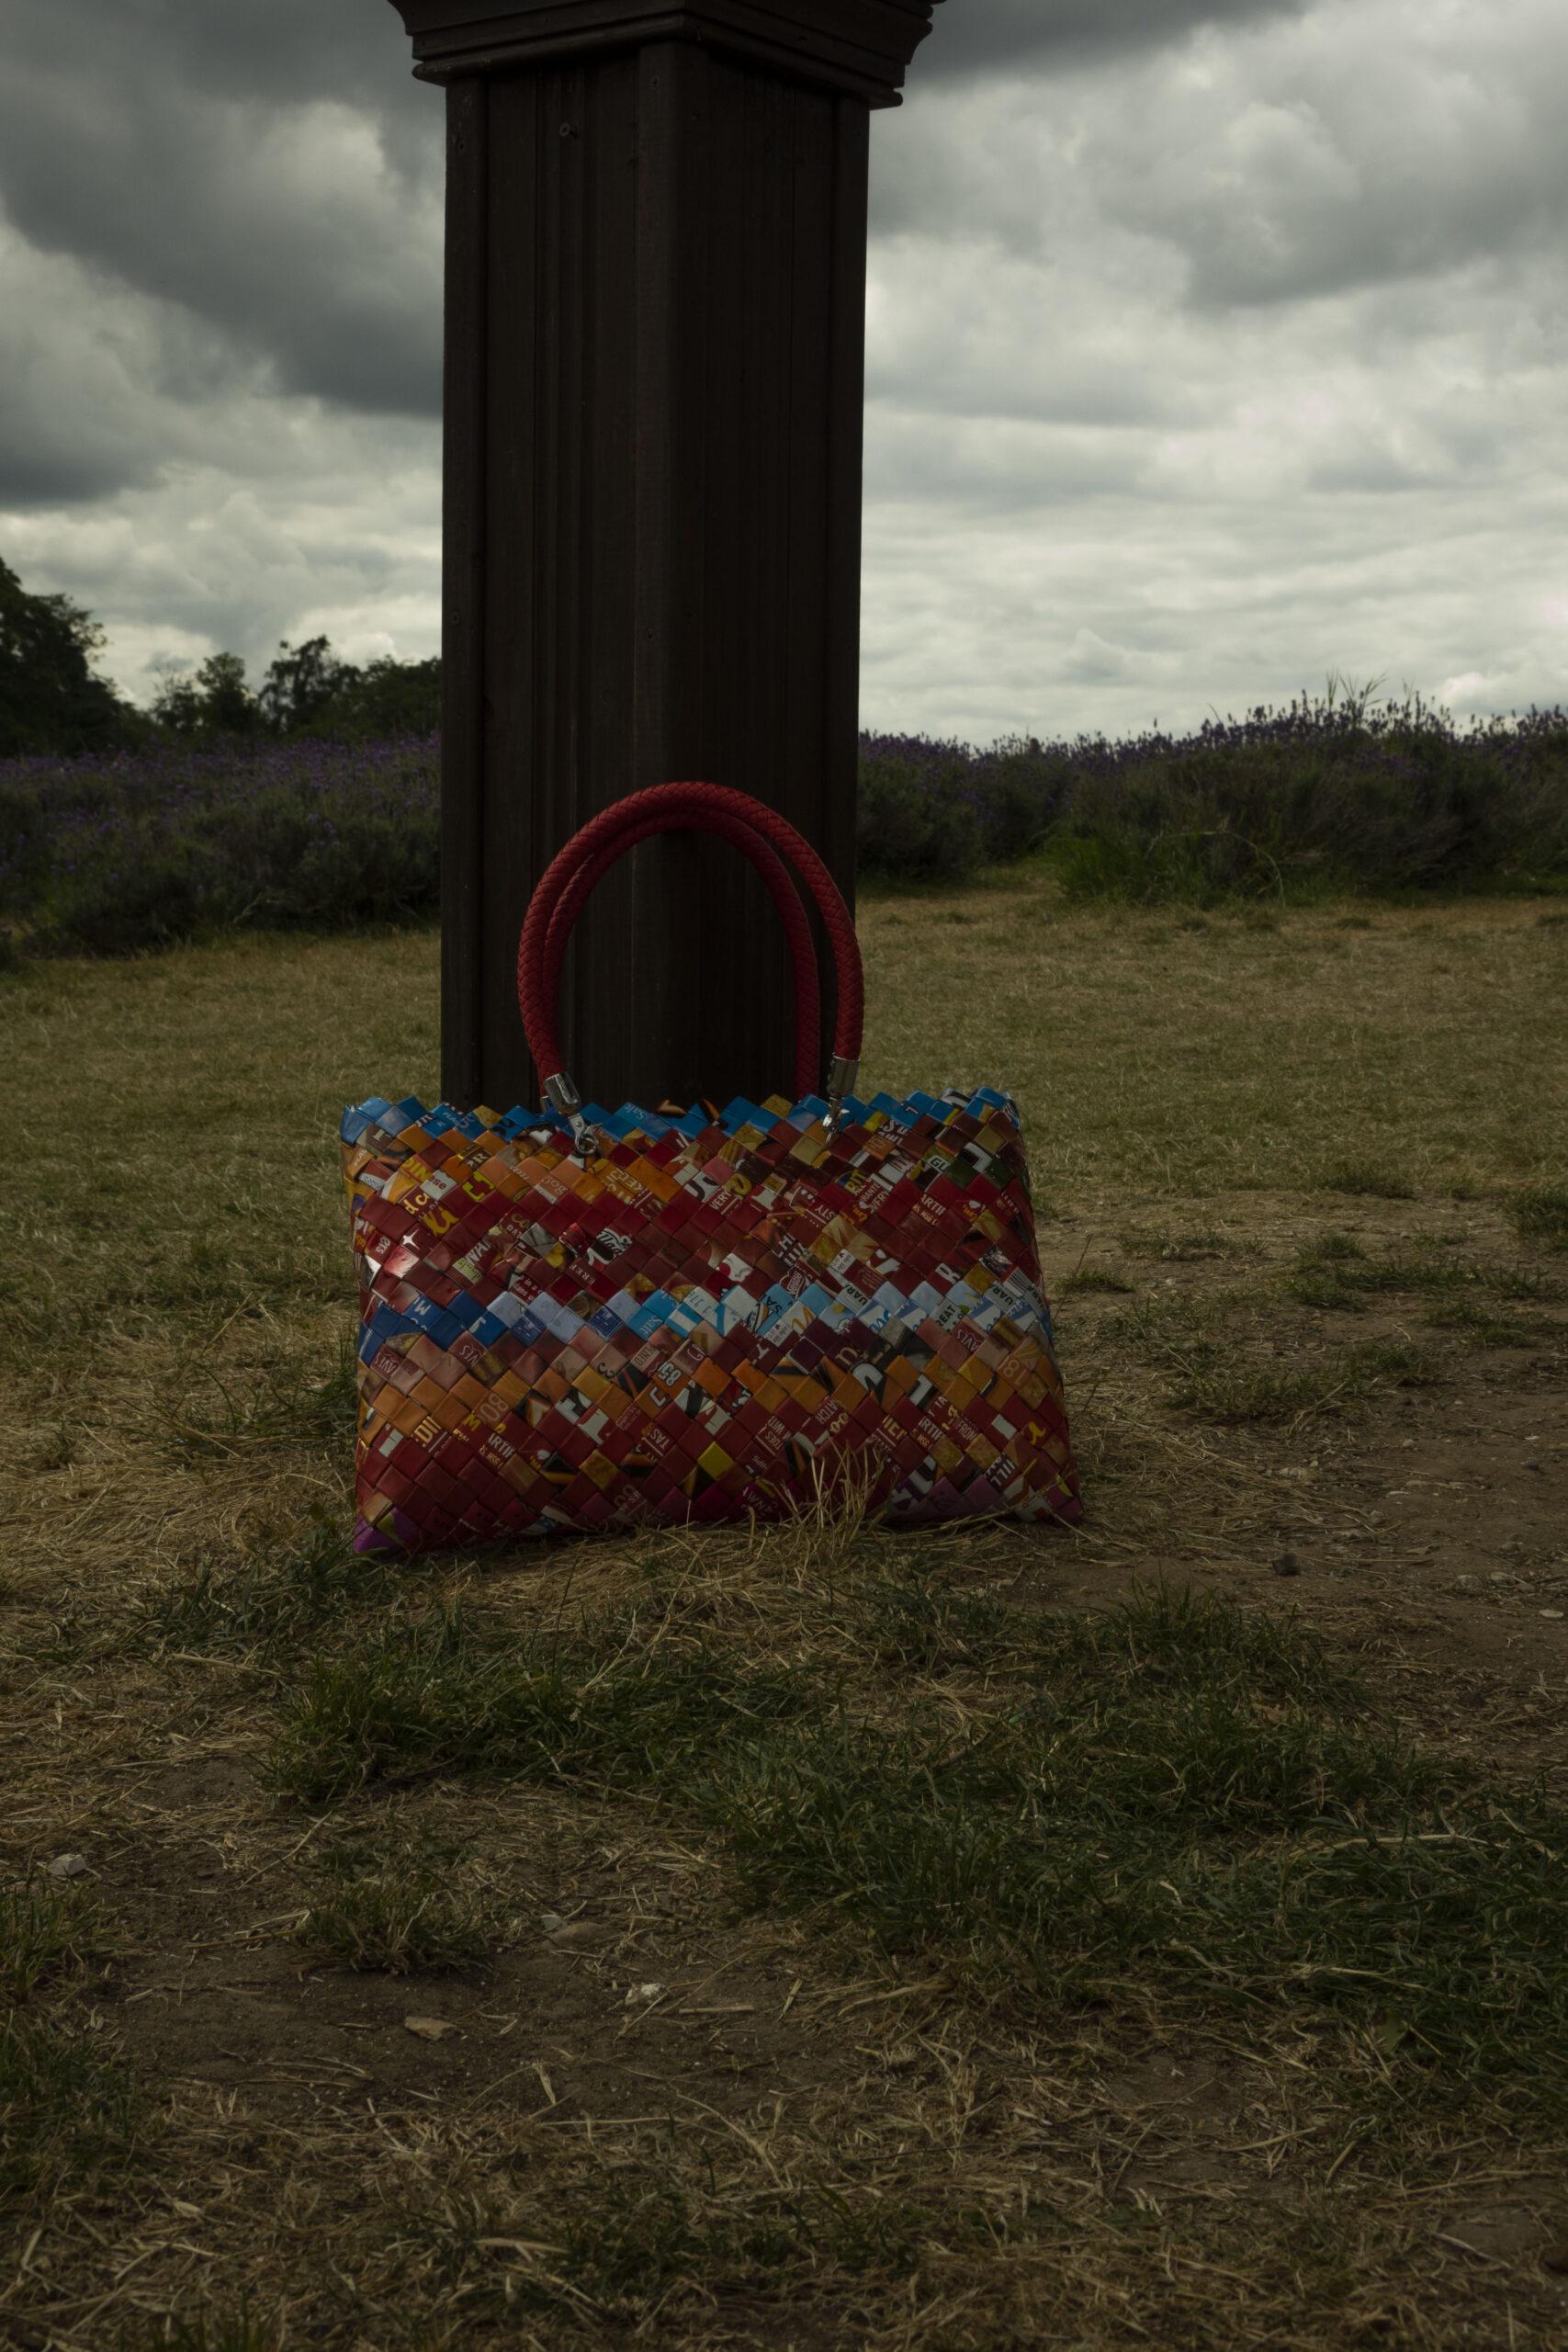 red walkers crisps bag